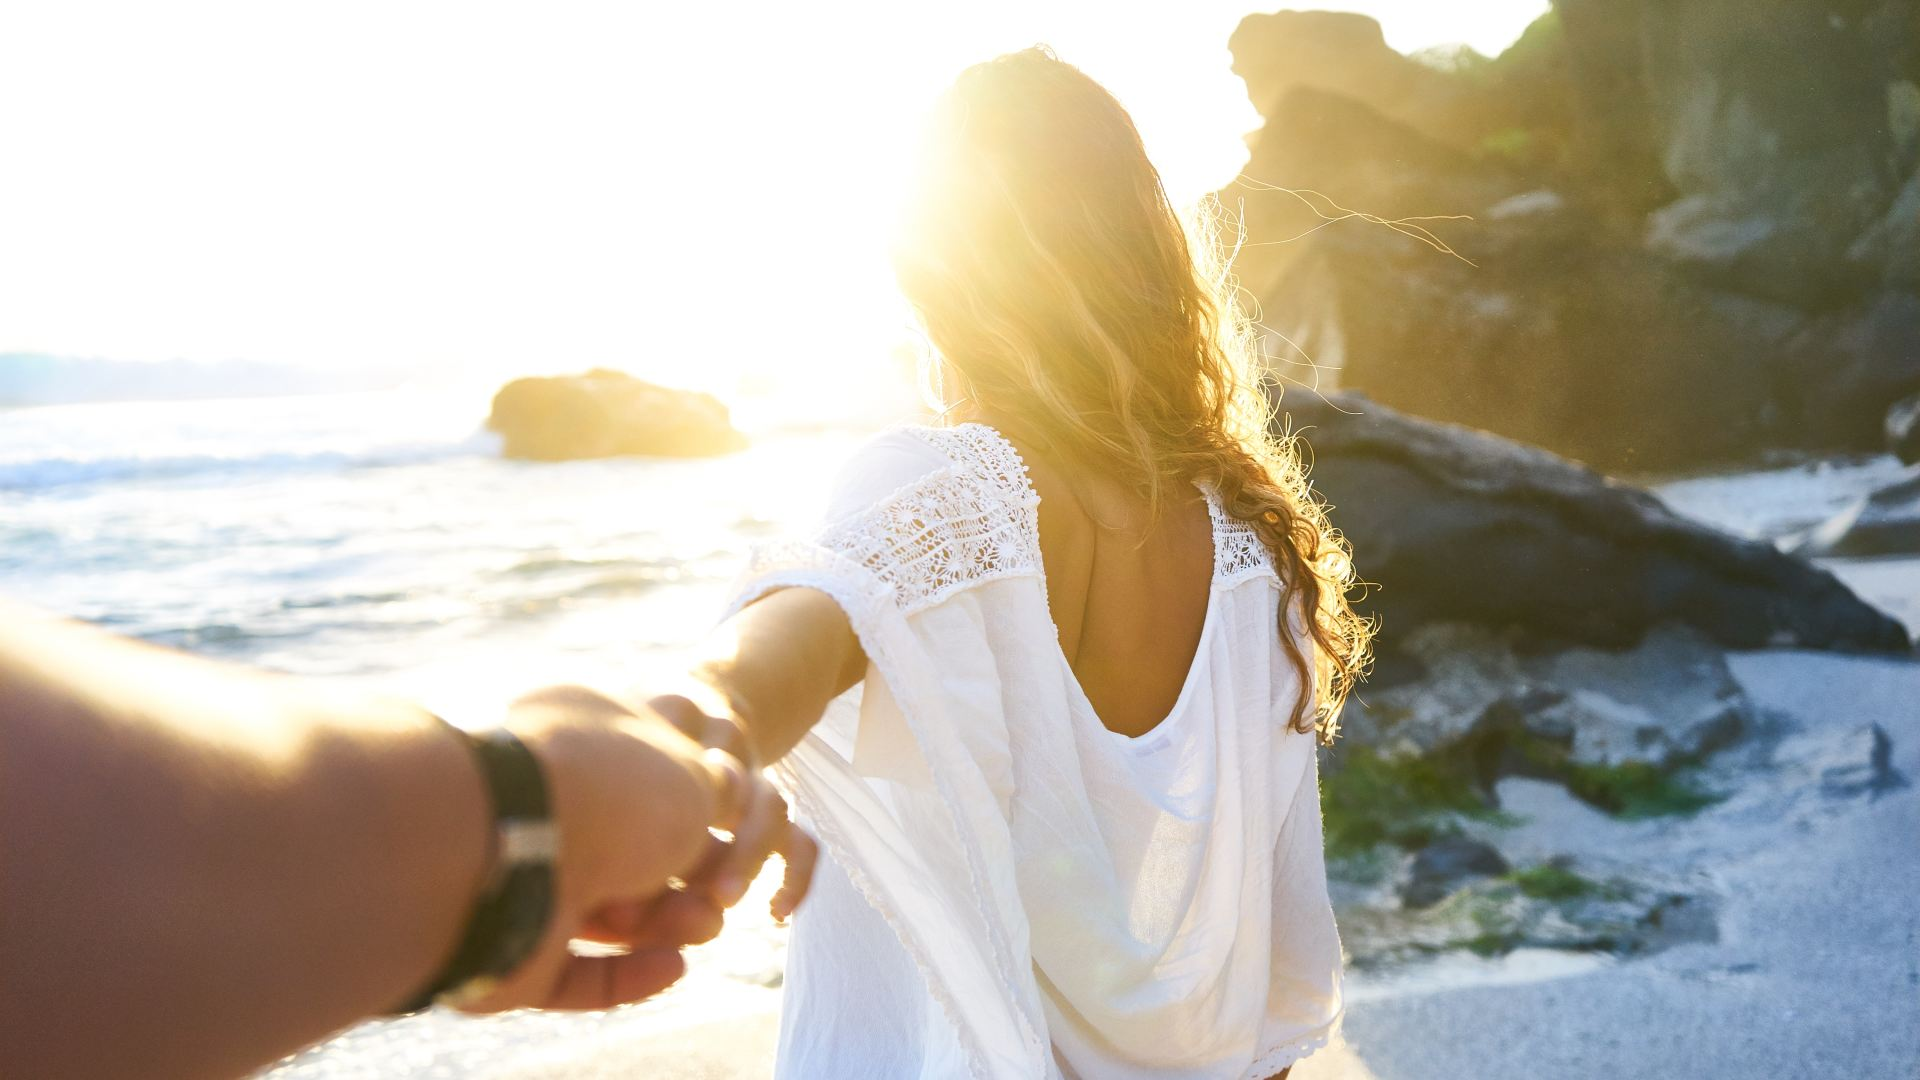 A couple on honeymoon in Portugal, Algarve